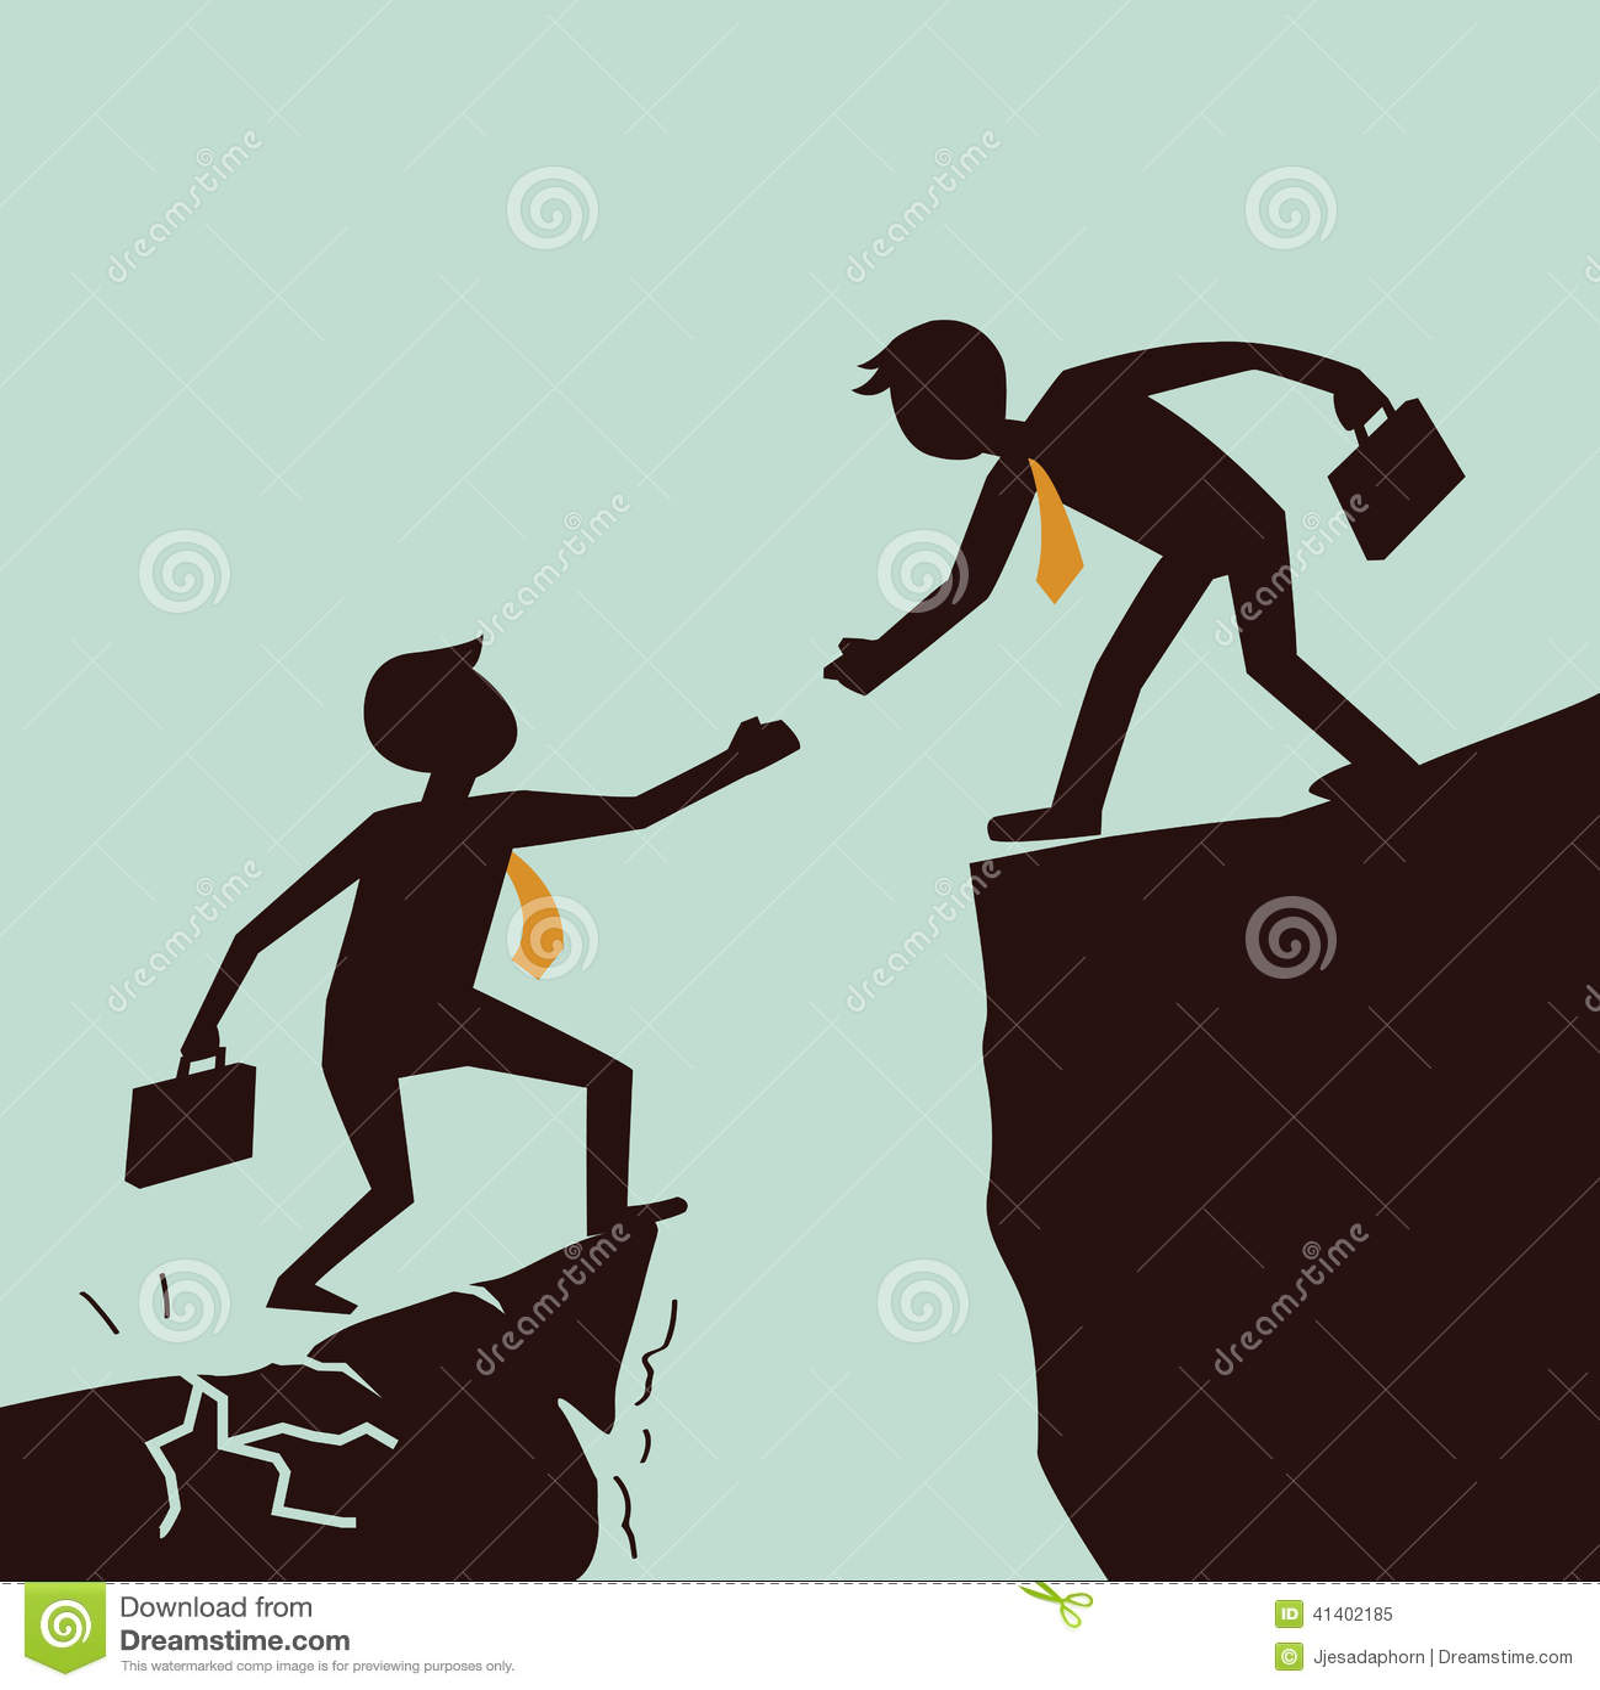 Helping Each Other: Business Help Cartoon Vector